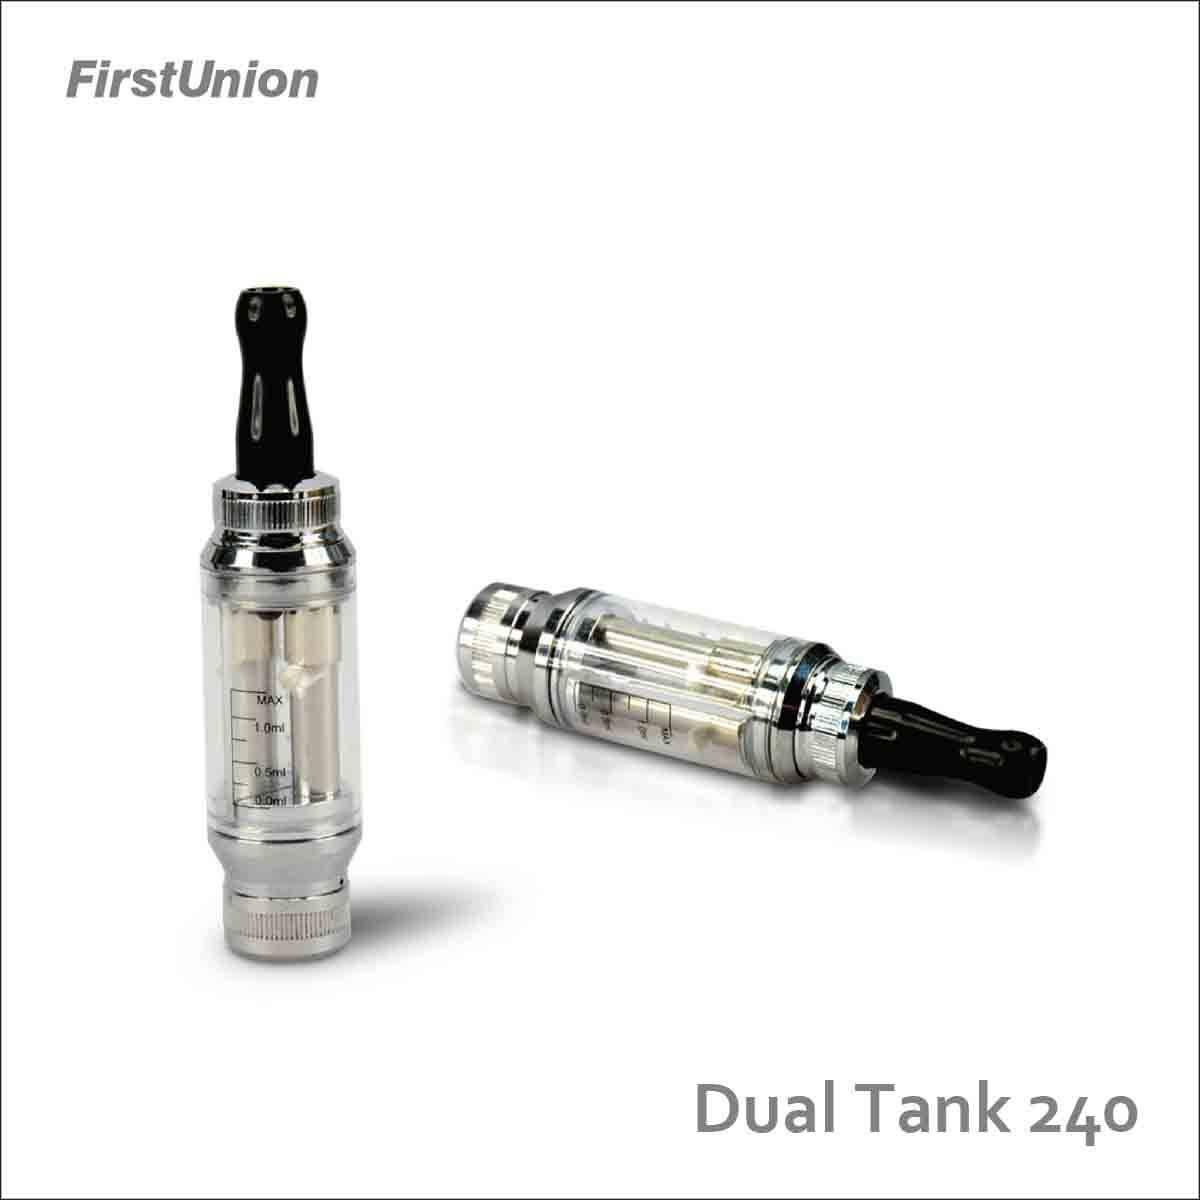 FirstUnion E-Cigarette Cartomizer Dual Tank 240